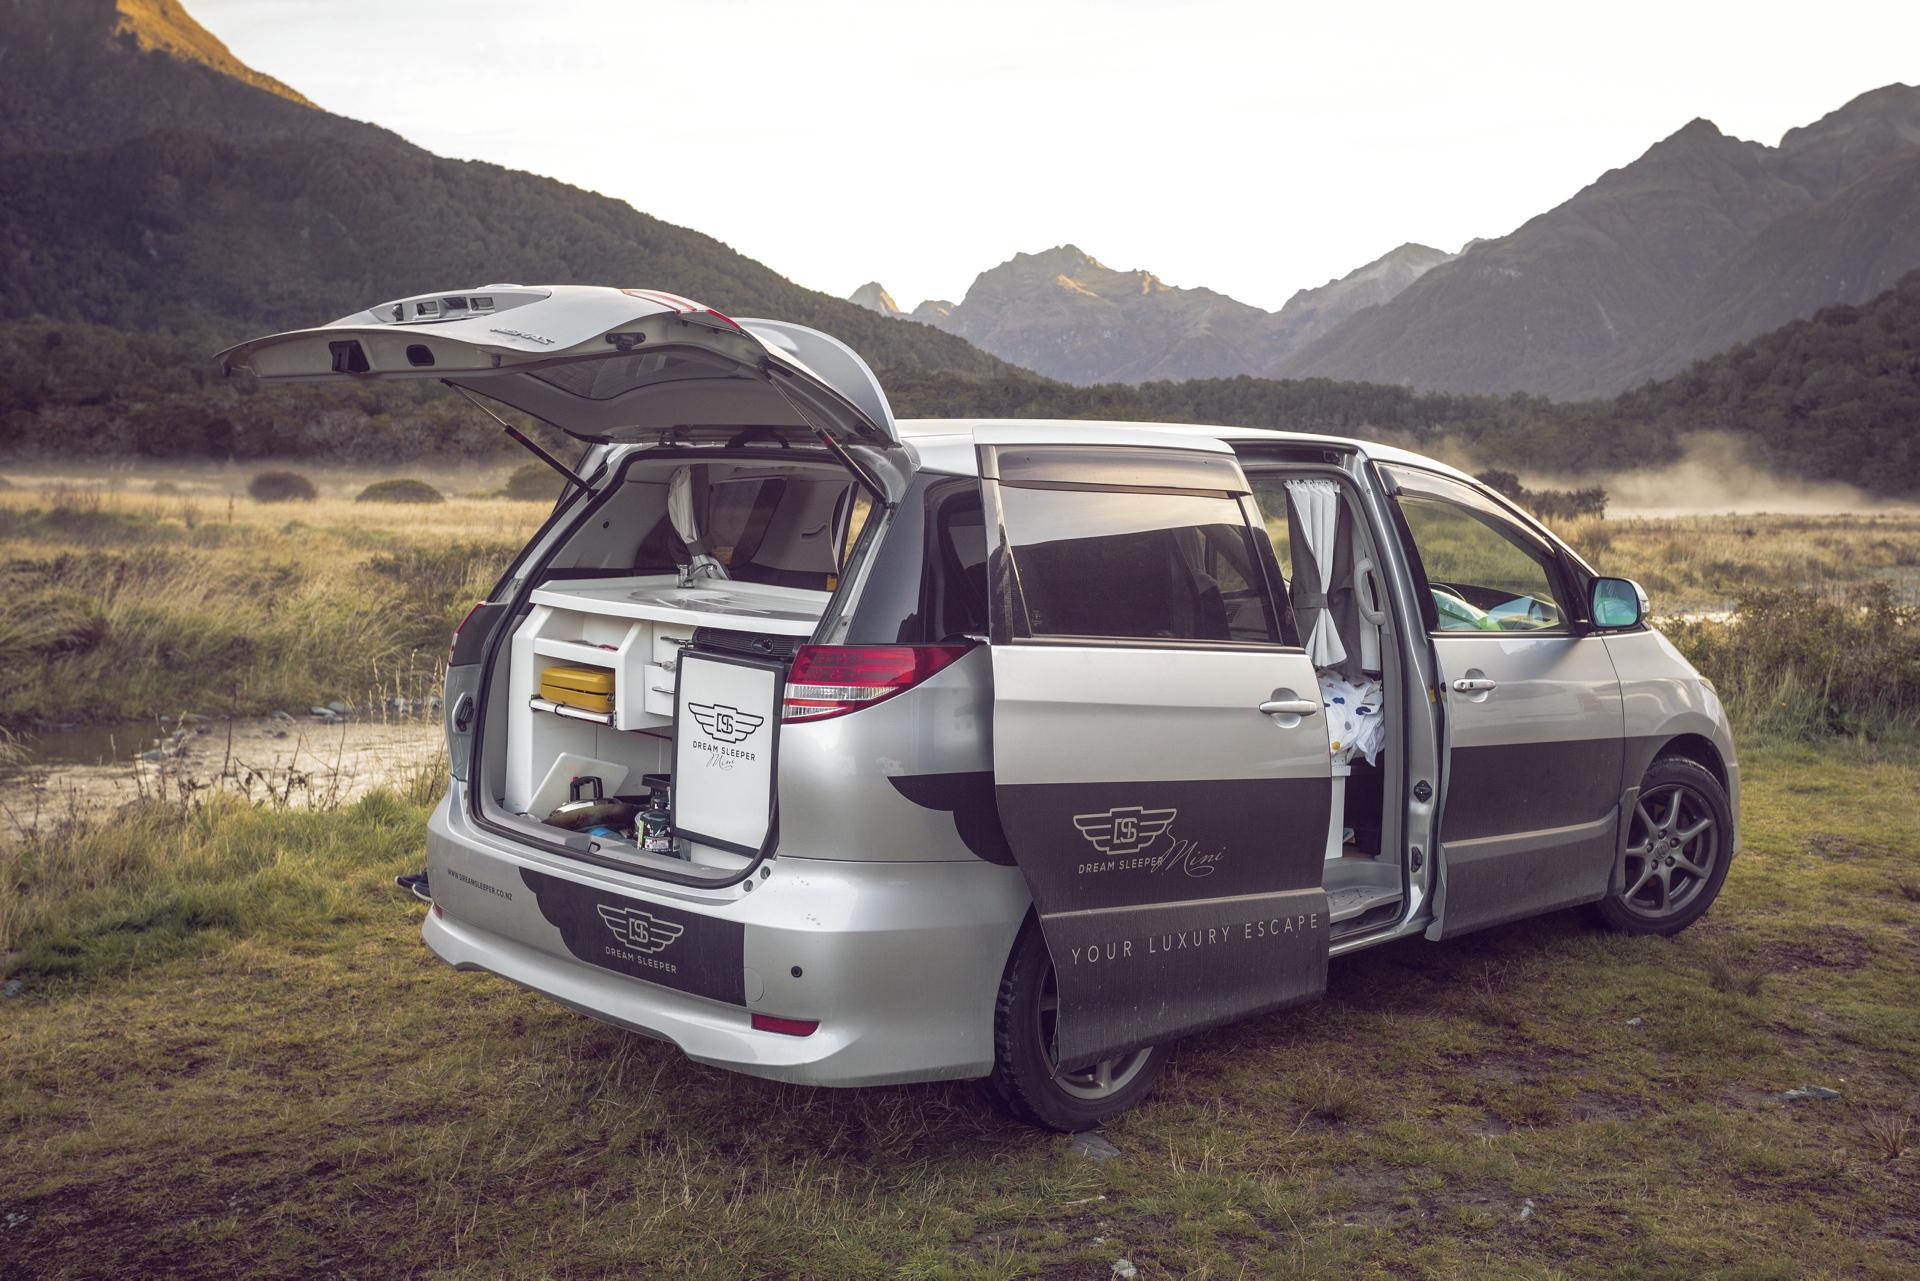 Mini Kühlschrank Mieten : Spaceship dream sleeper luxus wohnmobil mieten in neuseeland